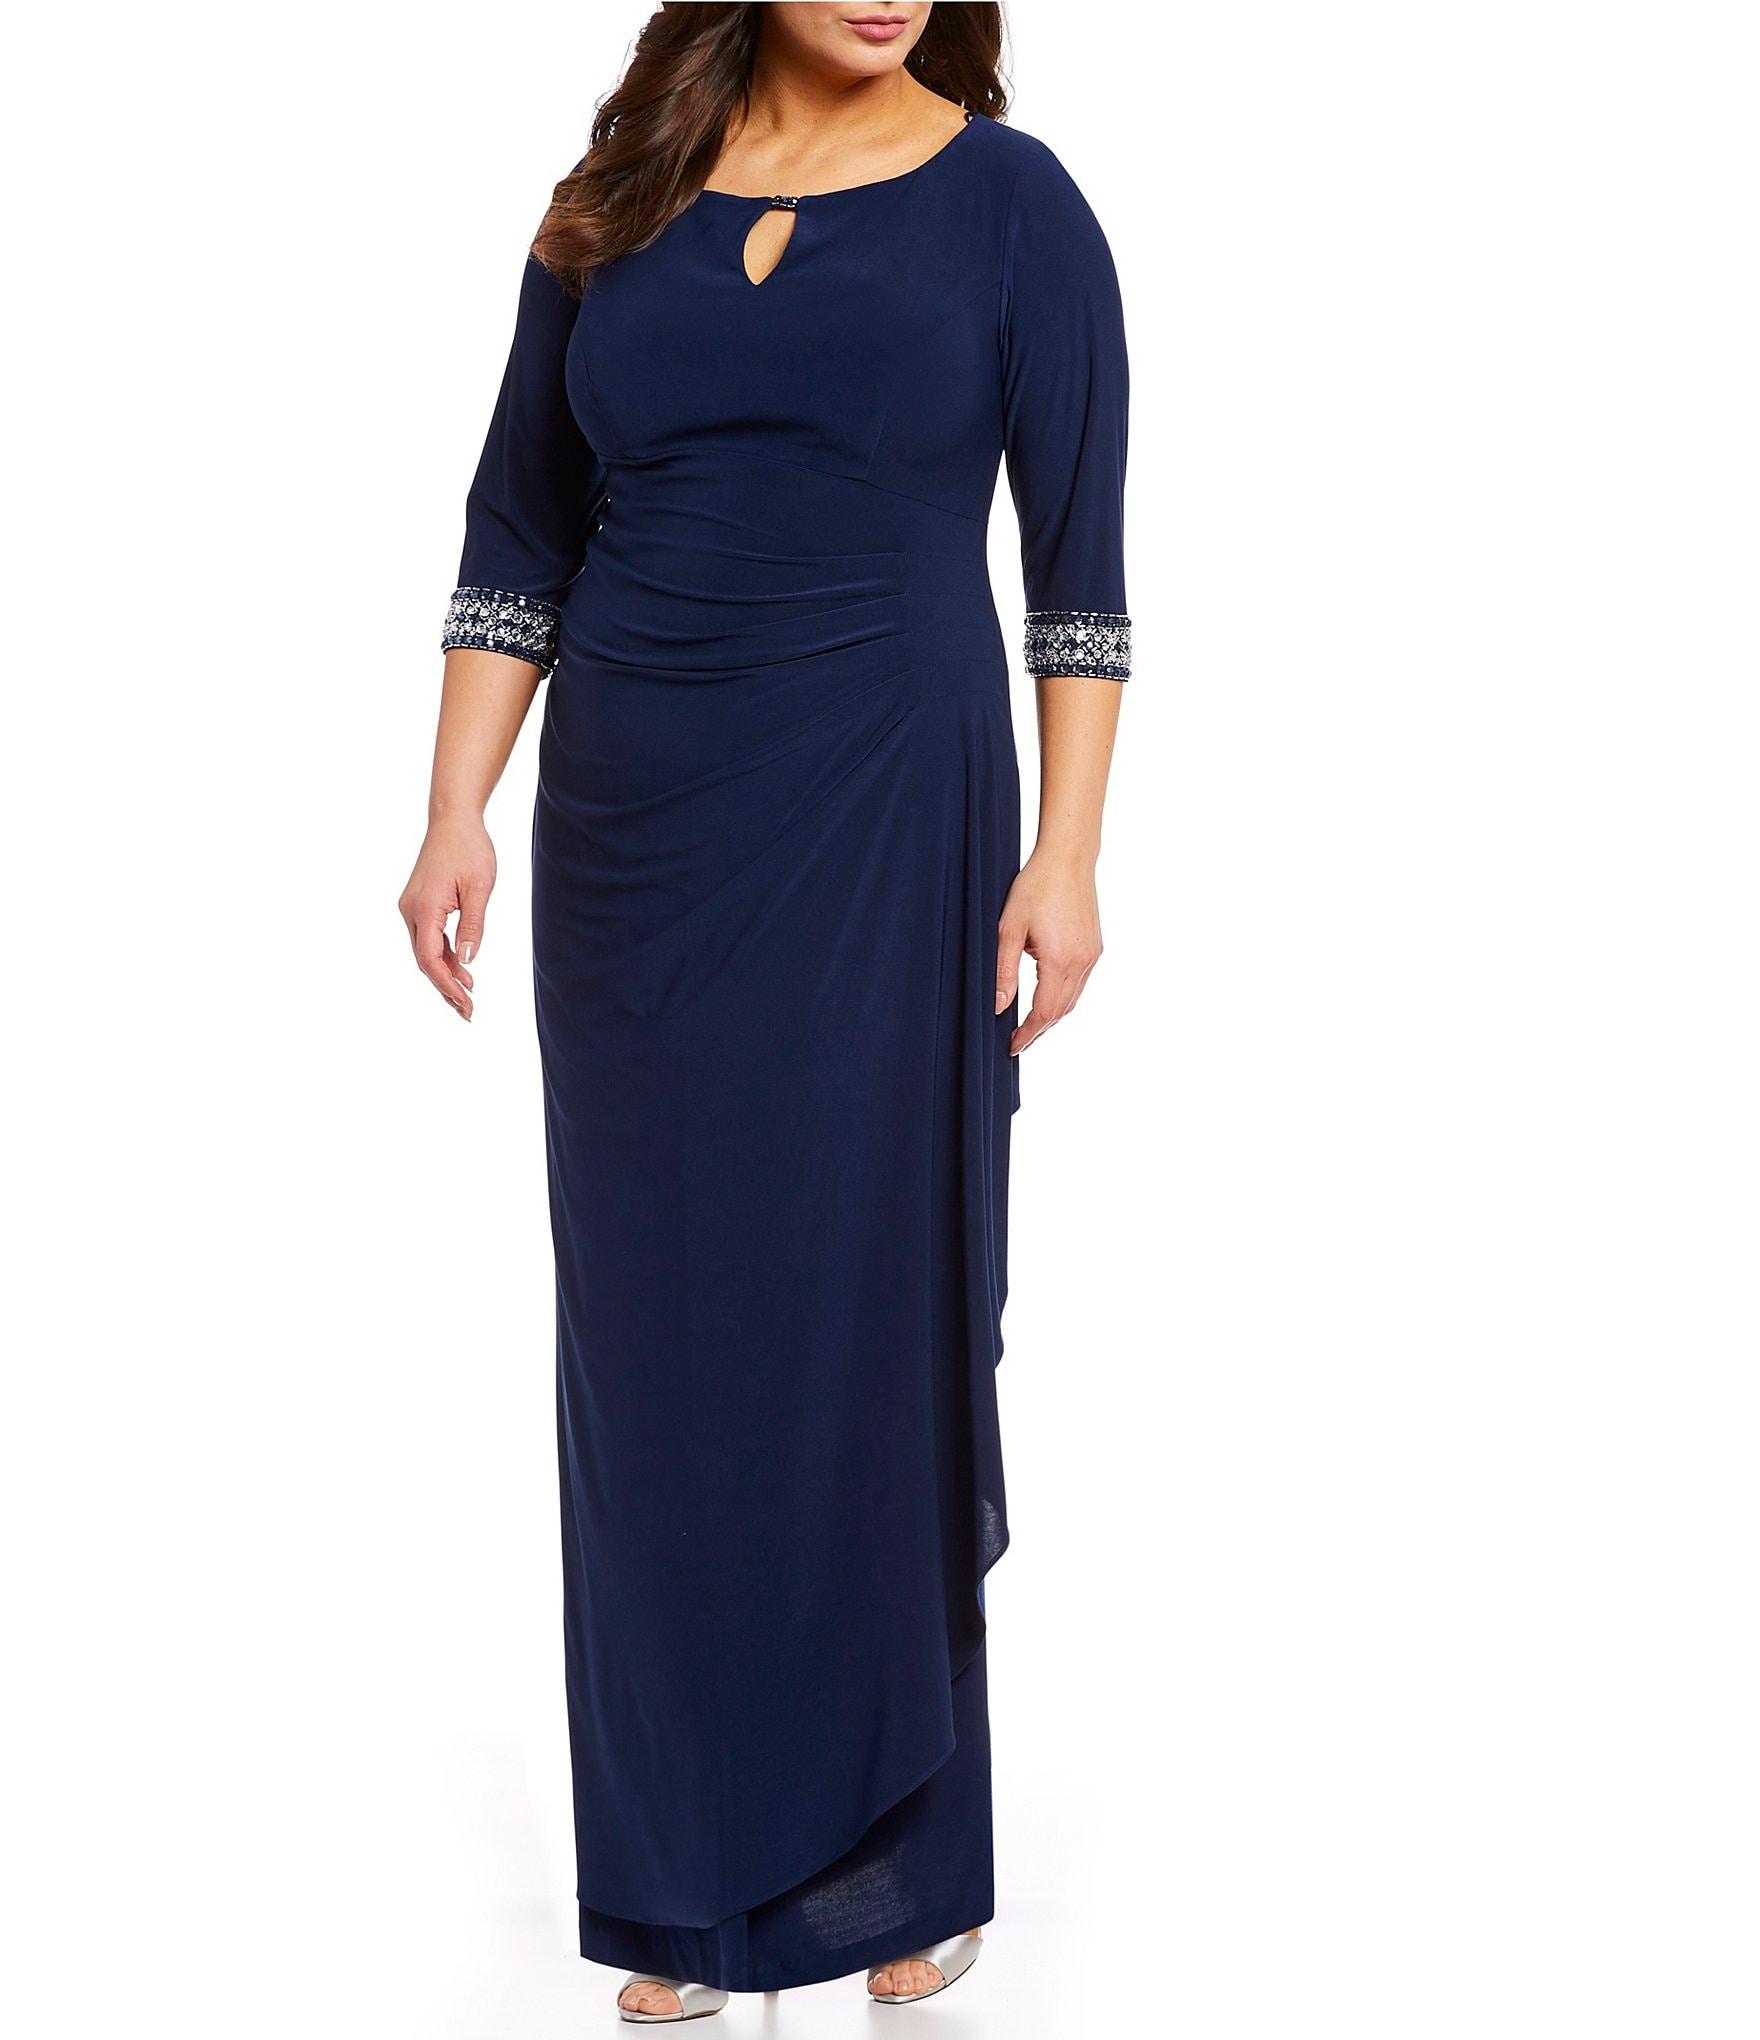 Dillard's Plus Size Evening Dresses for Women